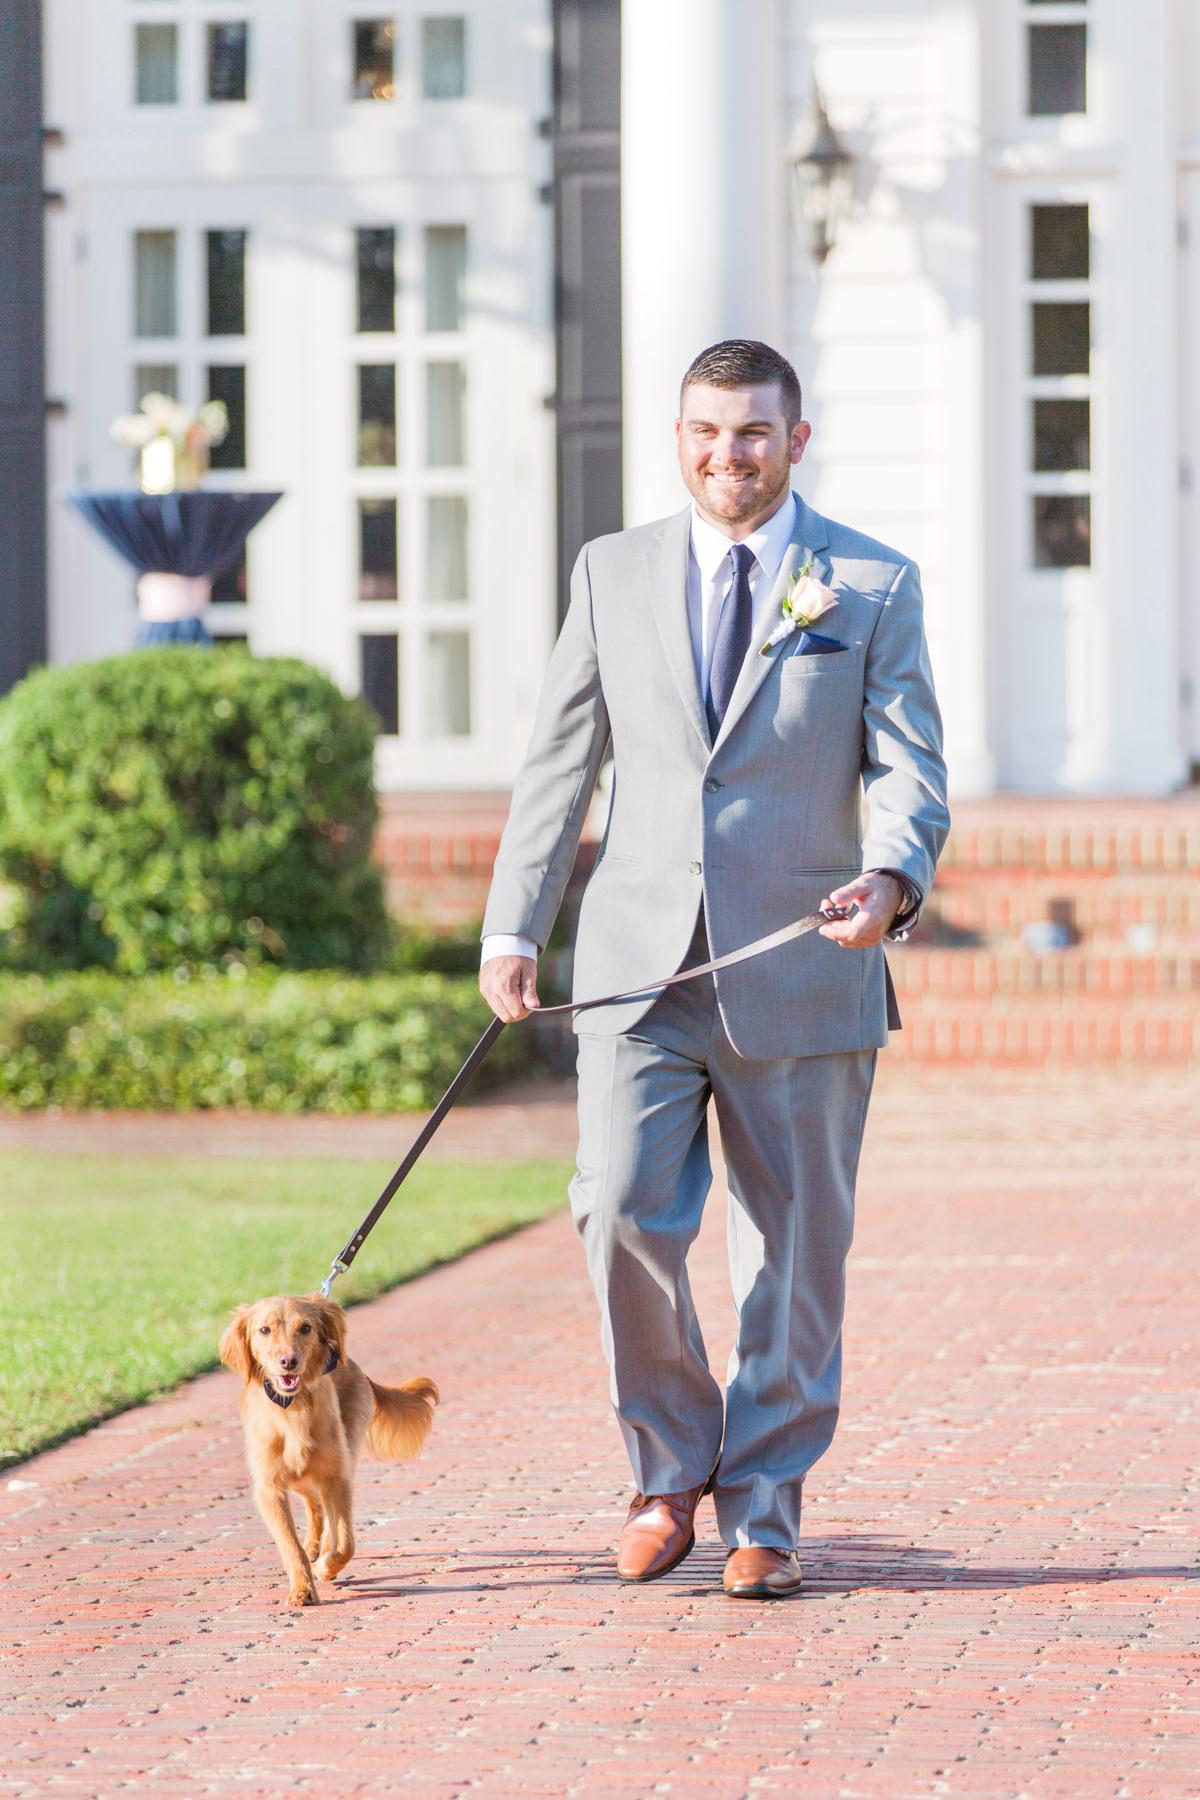 Groom, Dan with Dog Ozzie.jpg